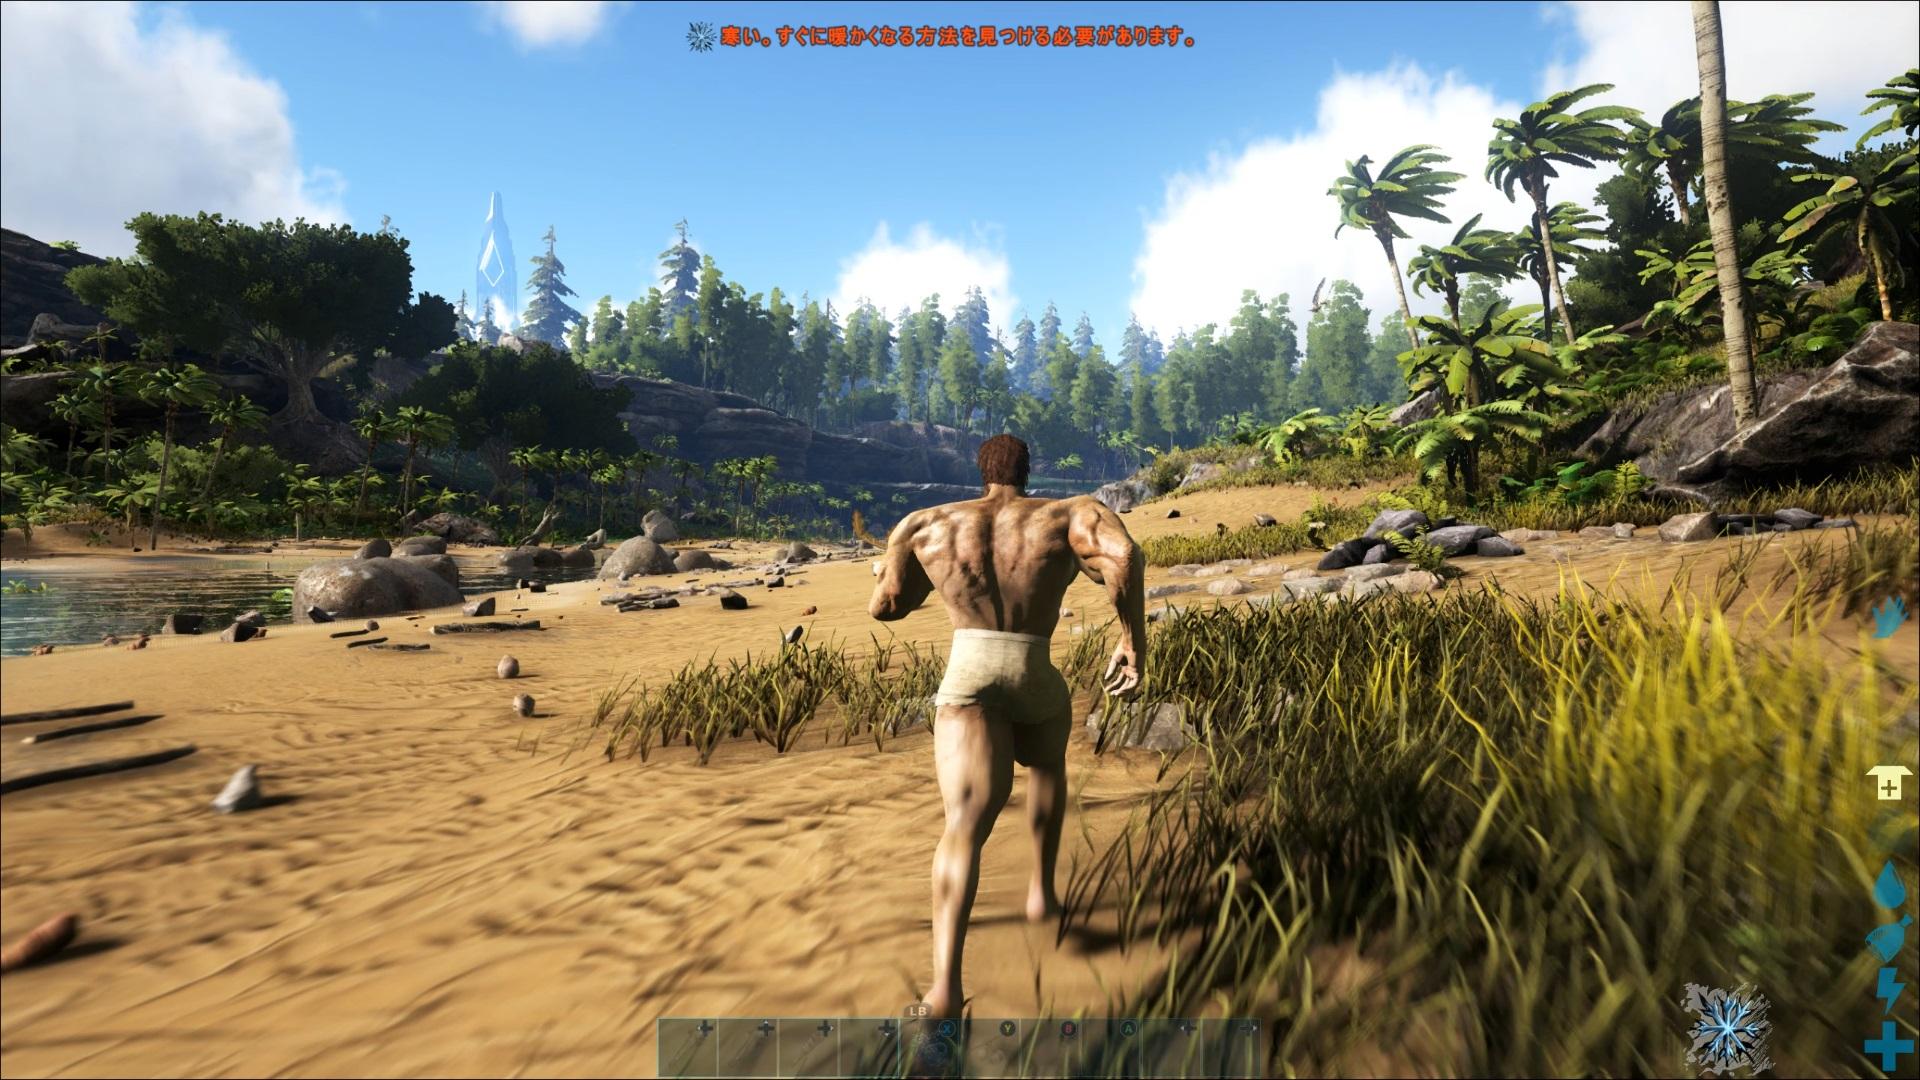 5416ab25935c57df74e2ec734a34b1ca - 【ARK Survival Evolved】序盤攻略【究極の恐竜時代を生き抜く!】